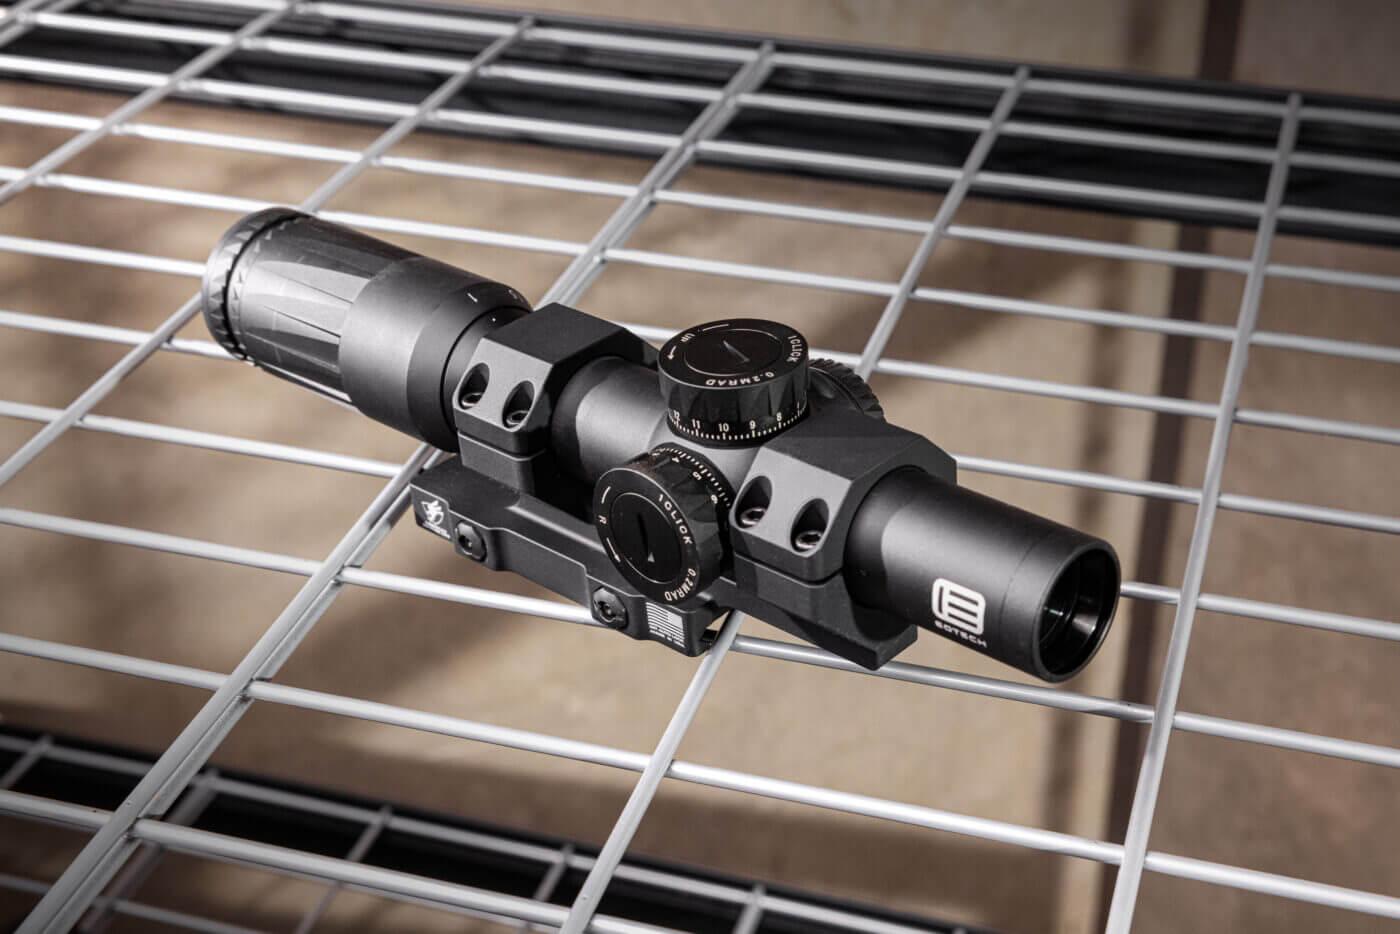 EOTECH Vudu 1-6x rifle scope